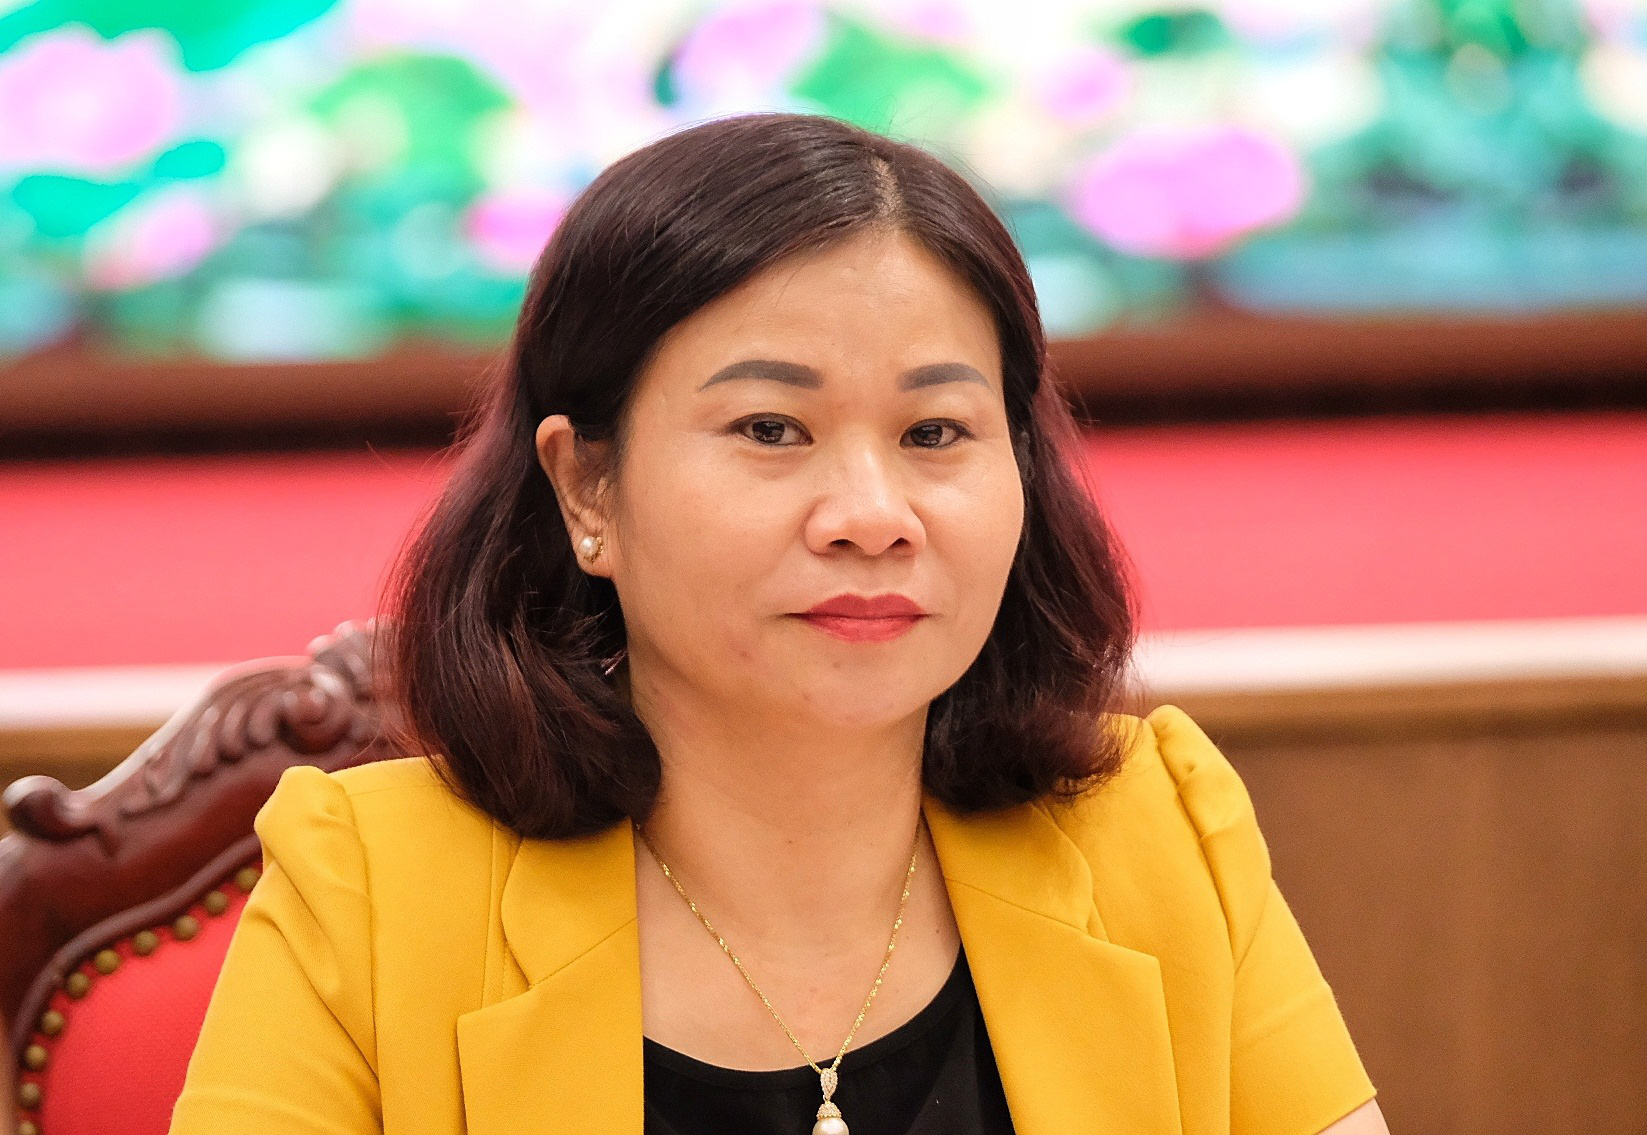 Nguyen Thi Tuyen, deputy secretary of the Hanoi Party Committee for the 2020-25 tenure. Photo: Nam Tran / Tuoi Tre